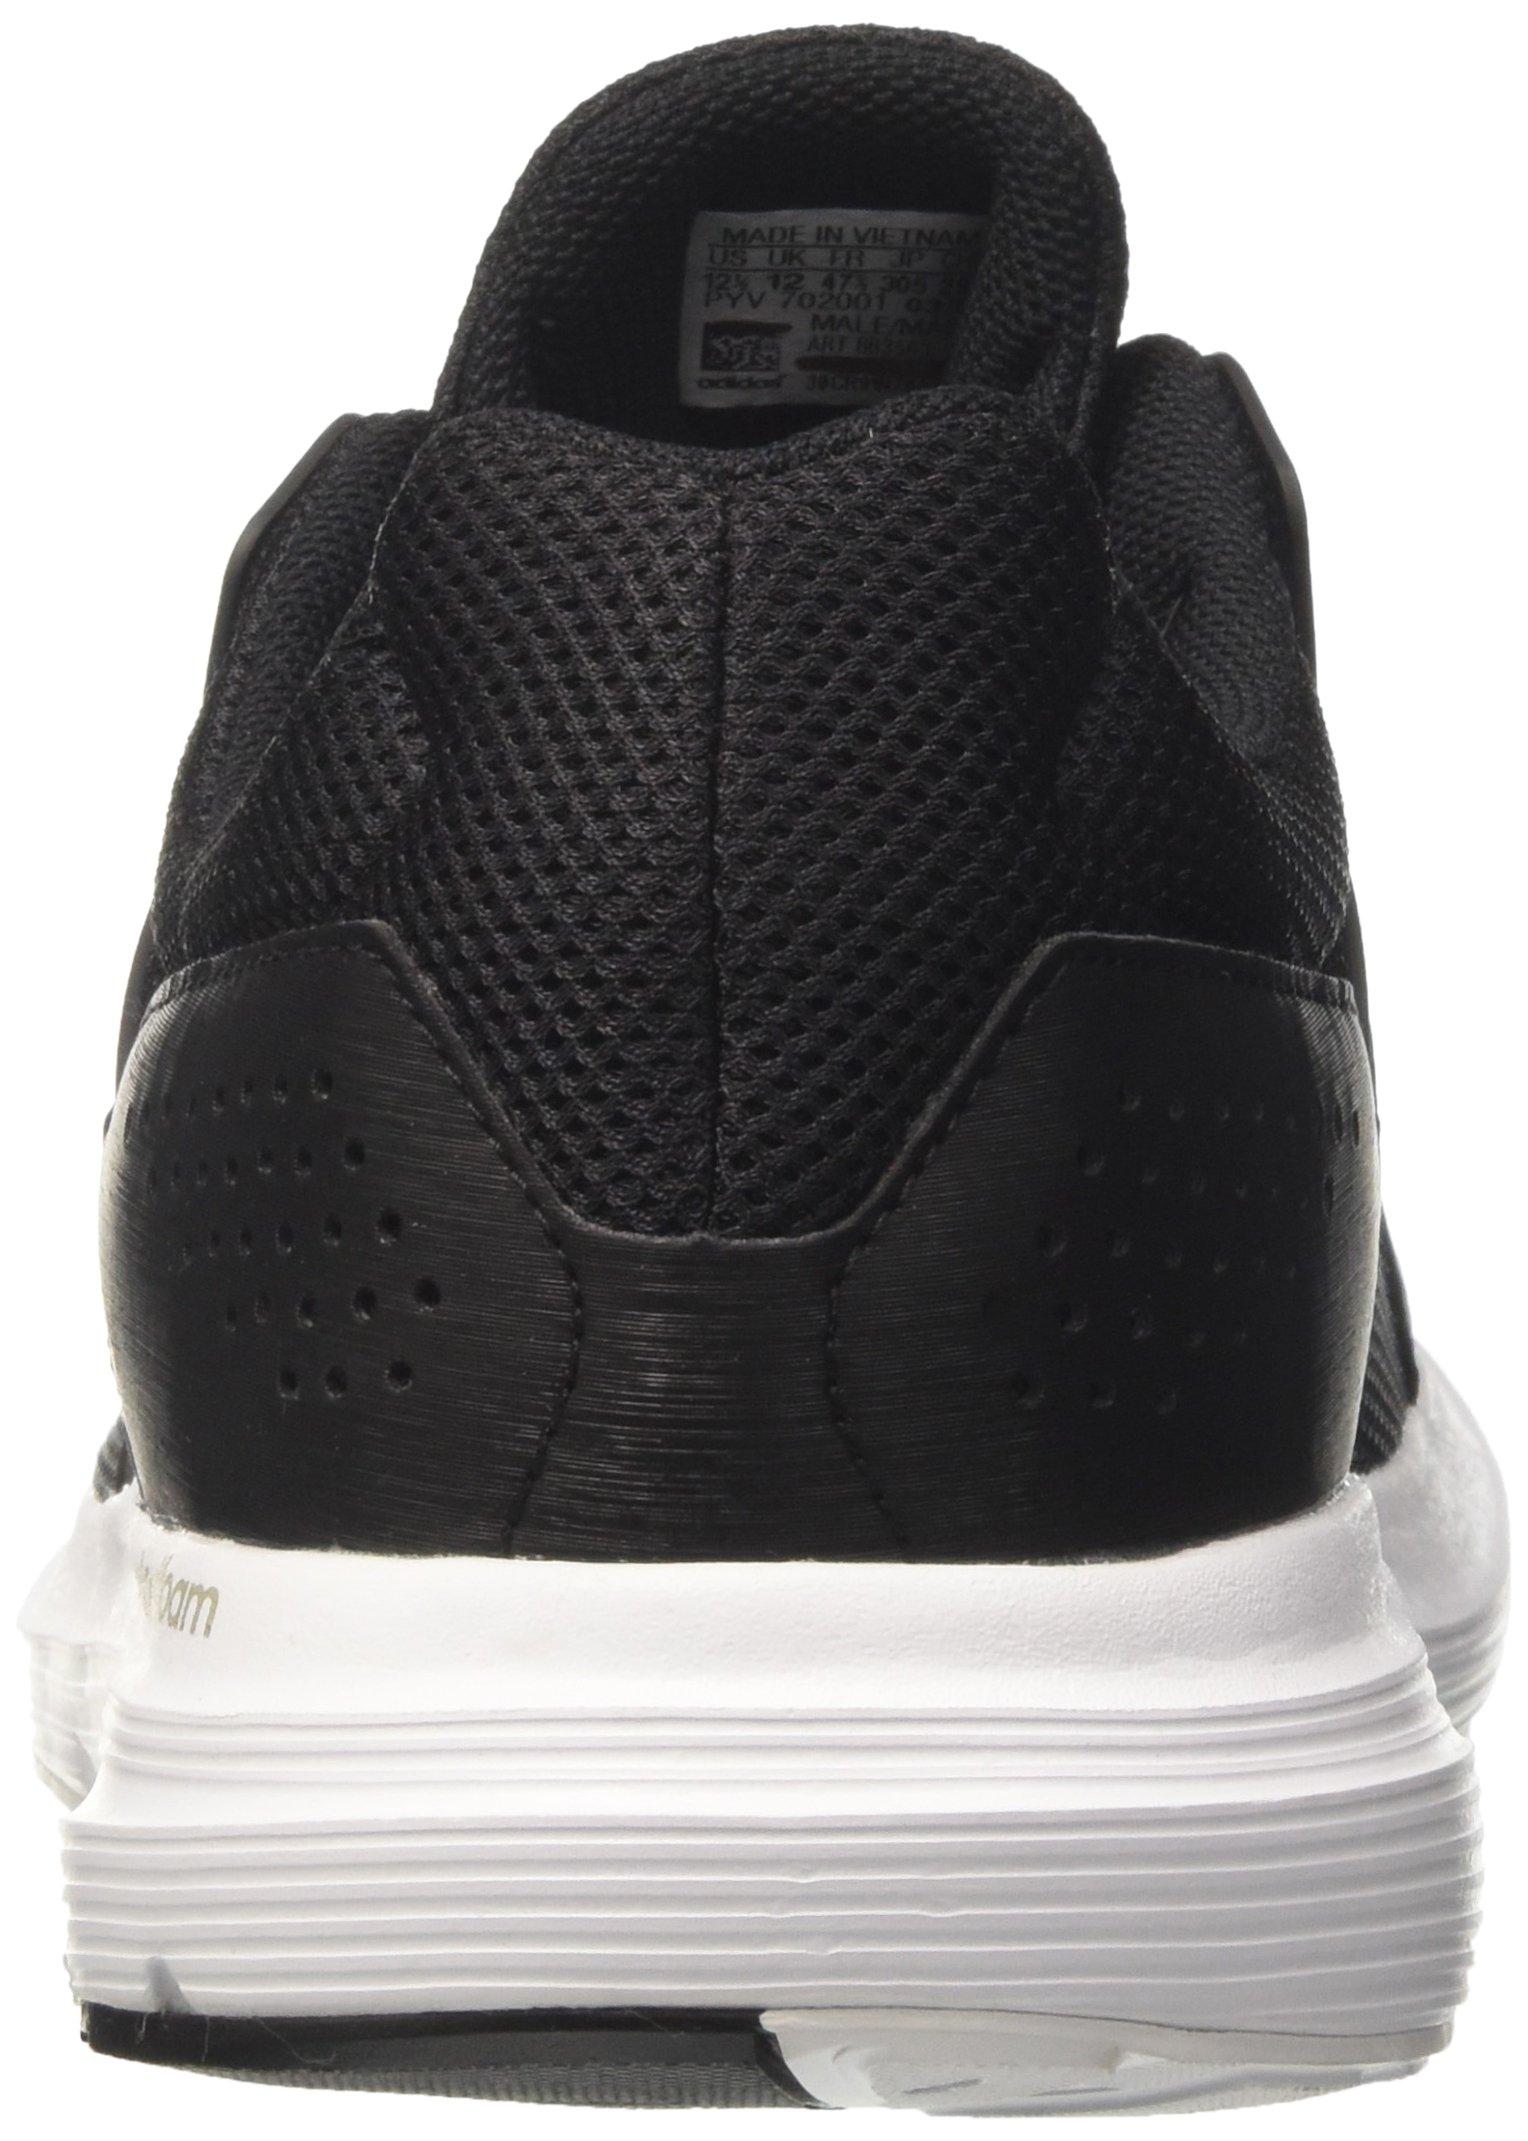 Adidas Galaxy 4 M, Scarpe da Running Uomo 2 spesavip